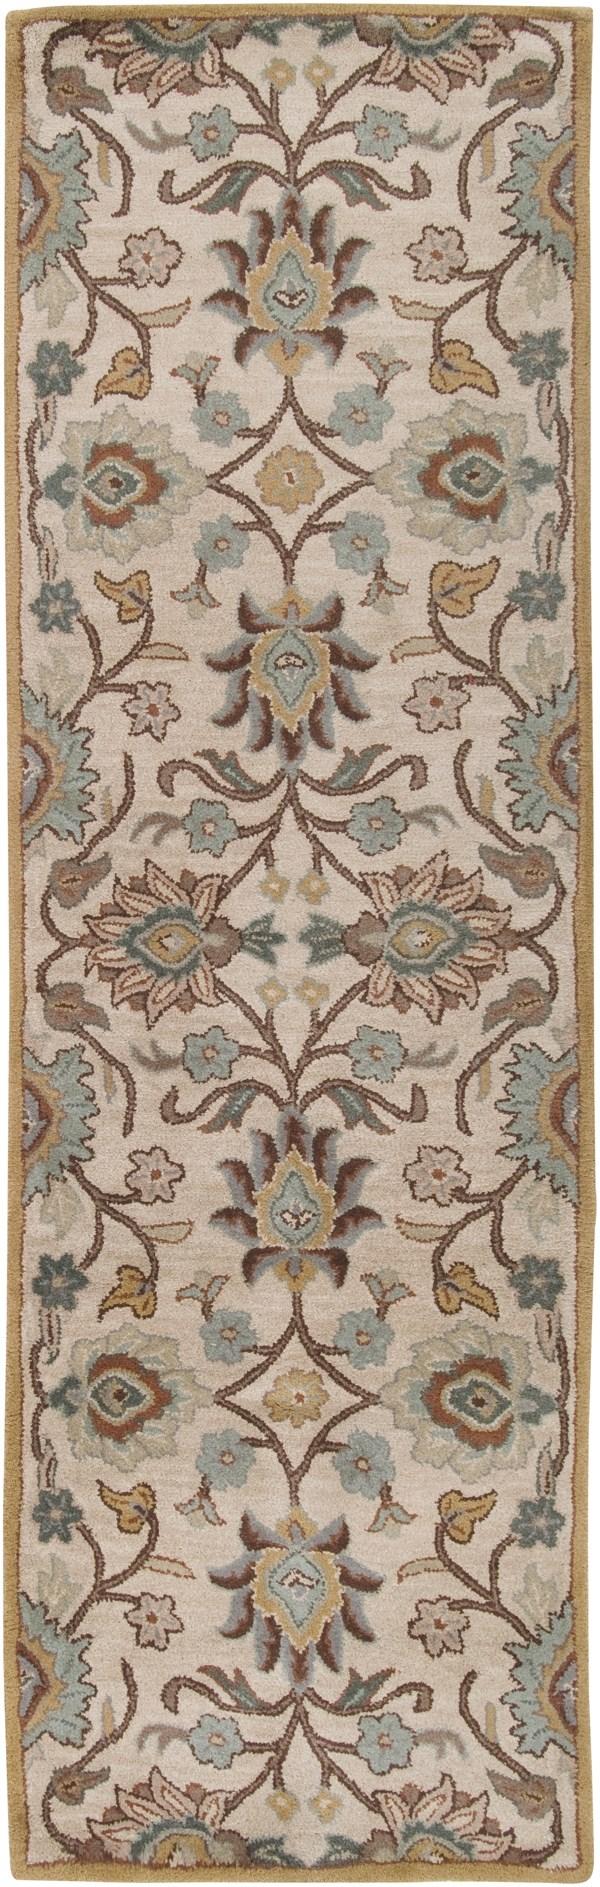 Medium Gray, Beige, Dark Brown, Charcoal Traditional / Oriental Area Rug